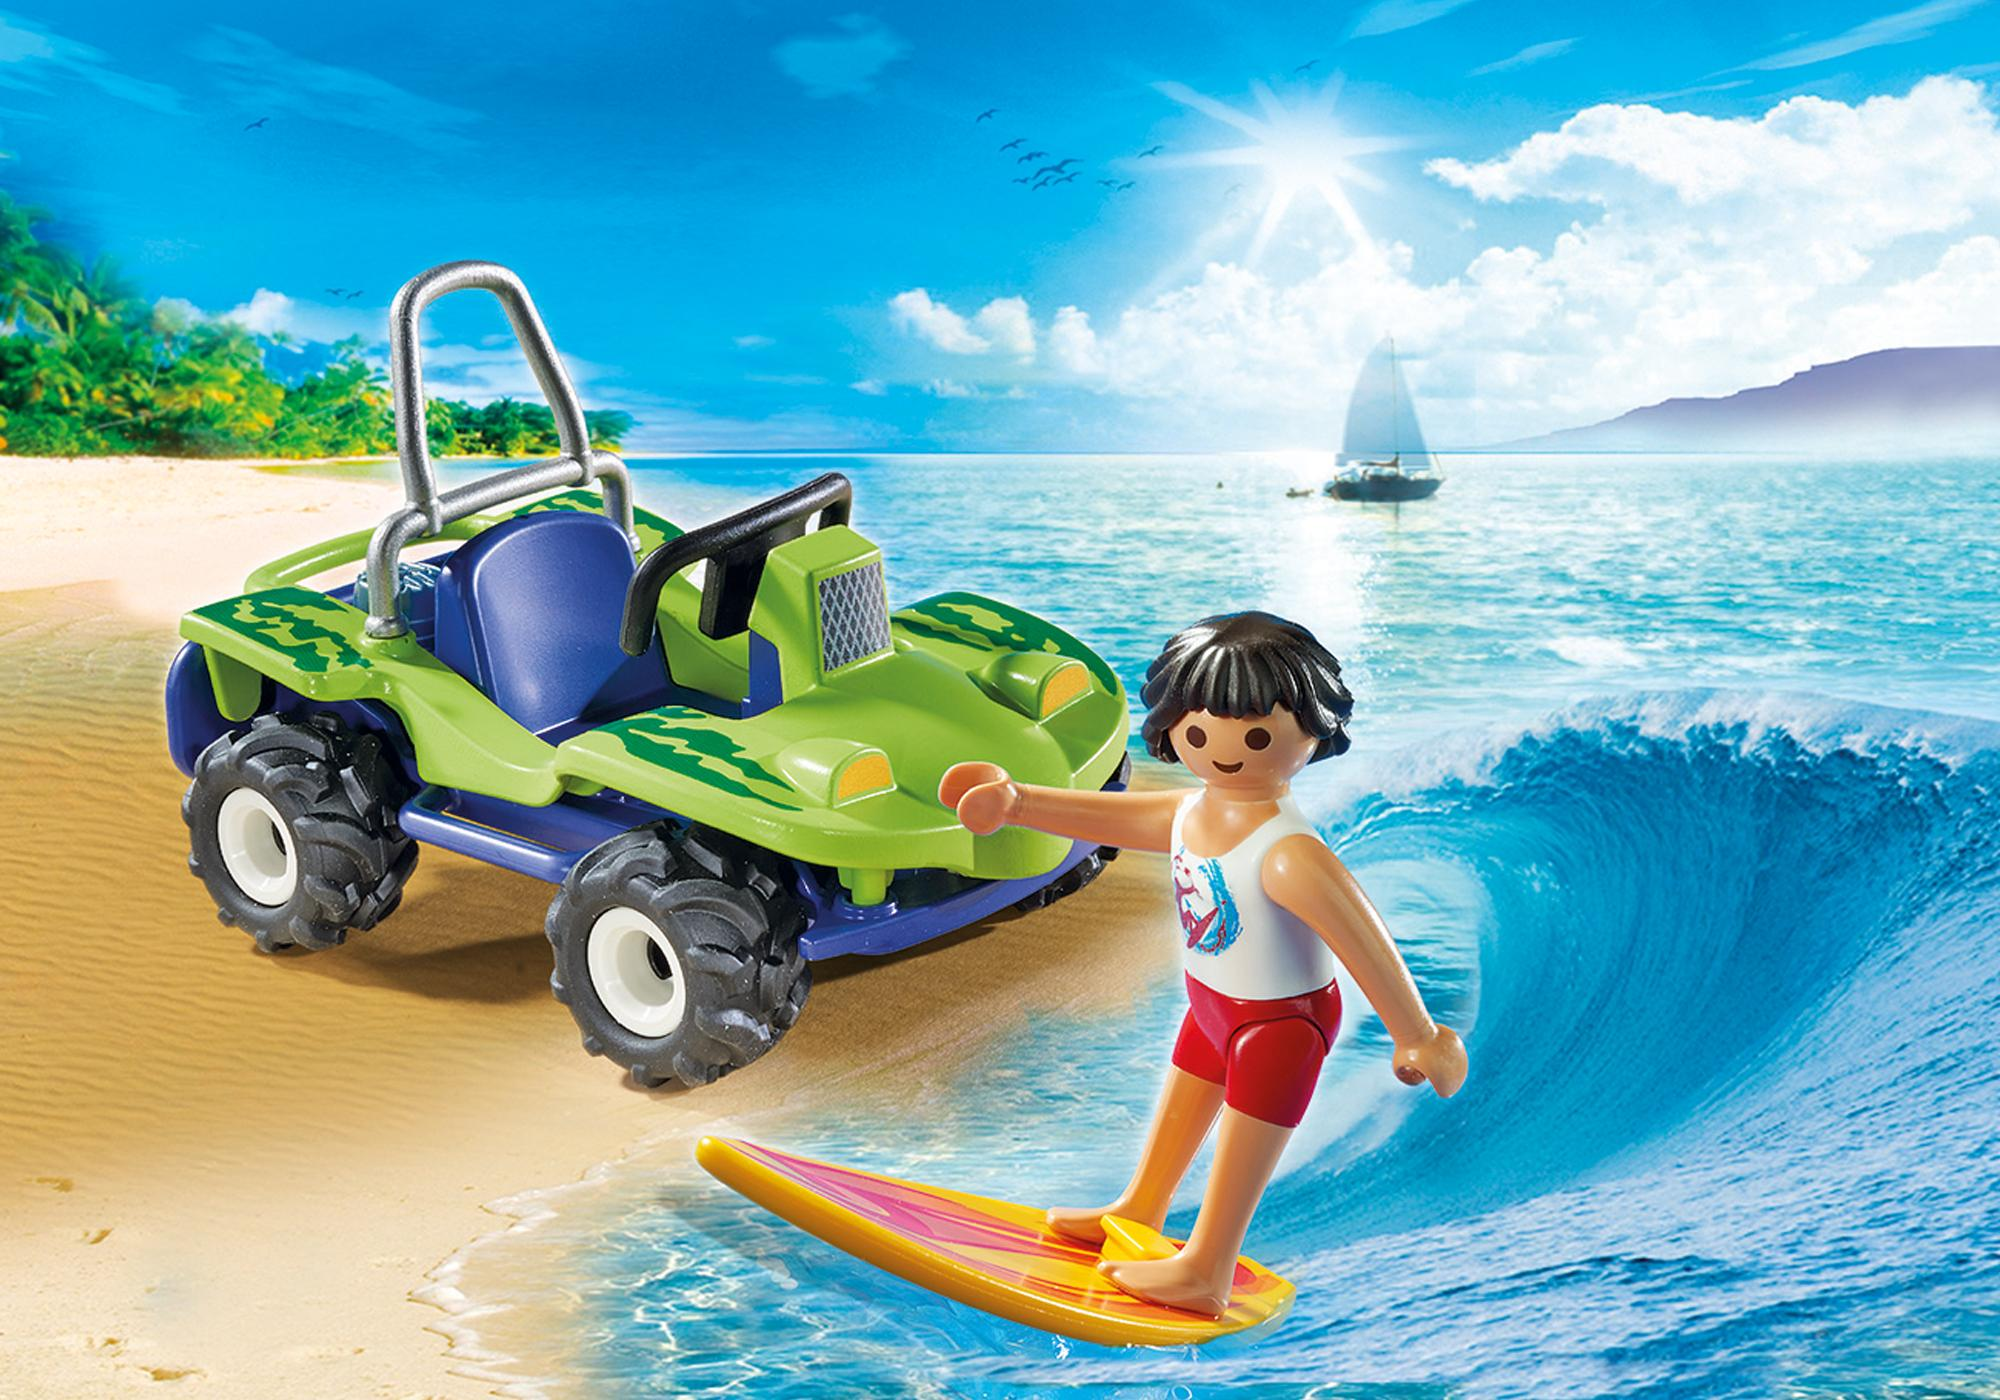 http://media.playmobil.com/i/playmobil/6982_product_detail/Surfer mit Strandbuggy